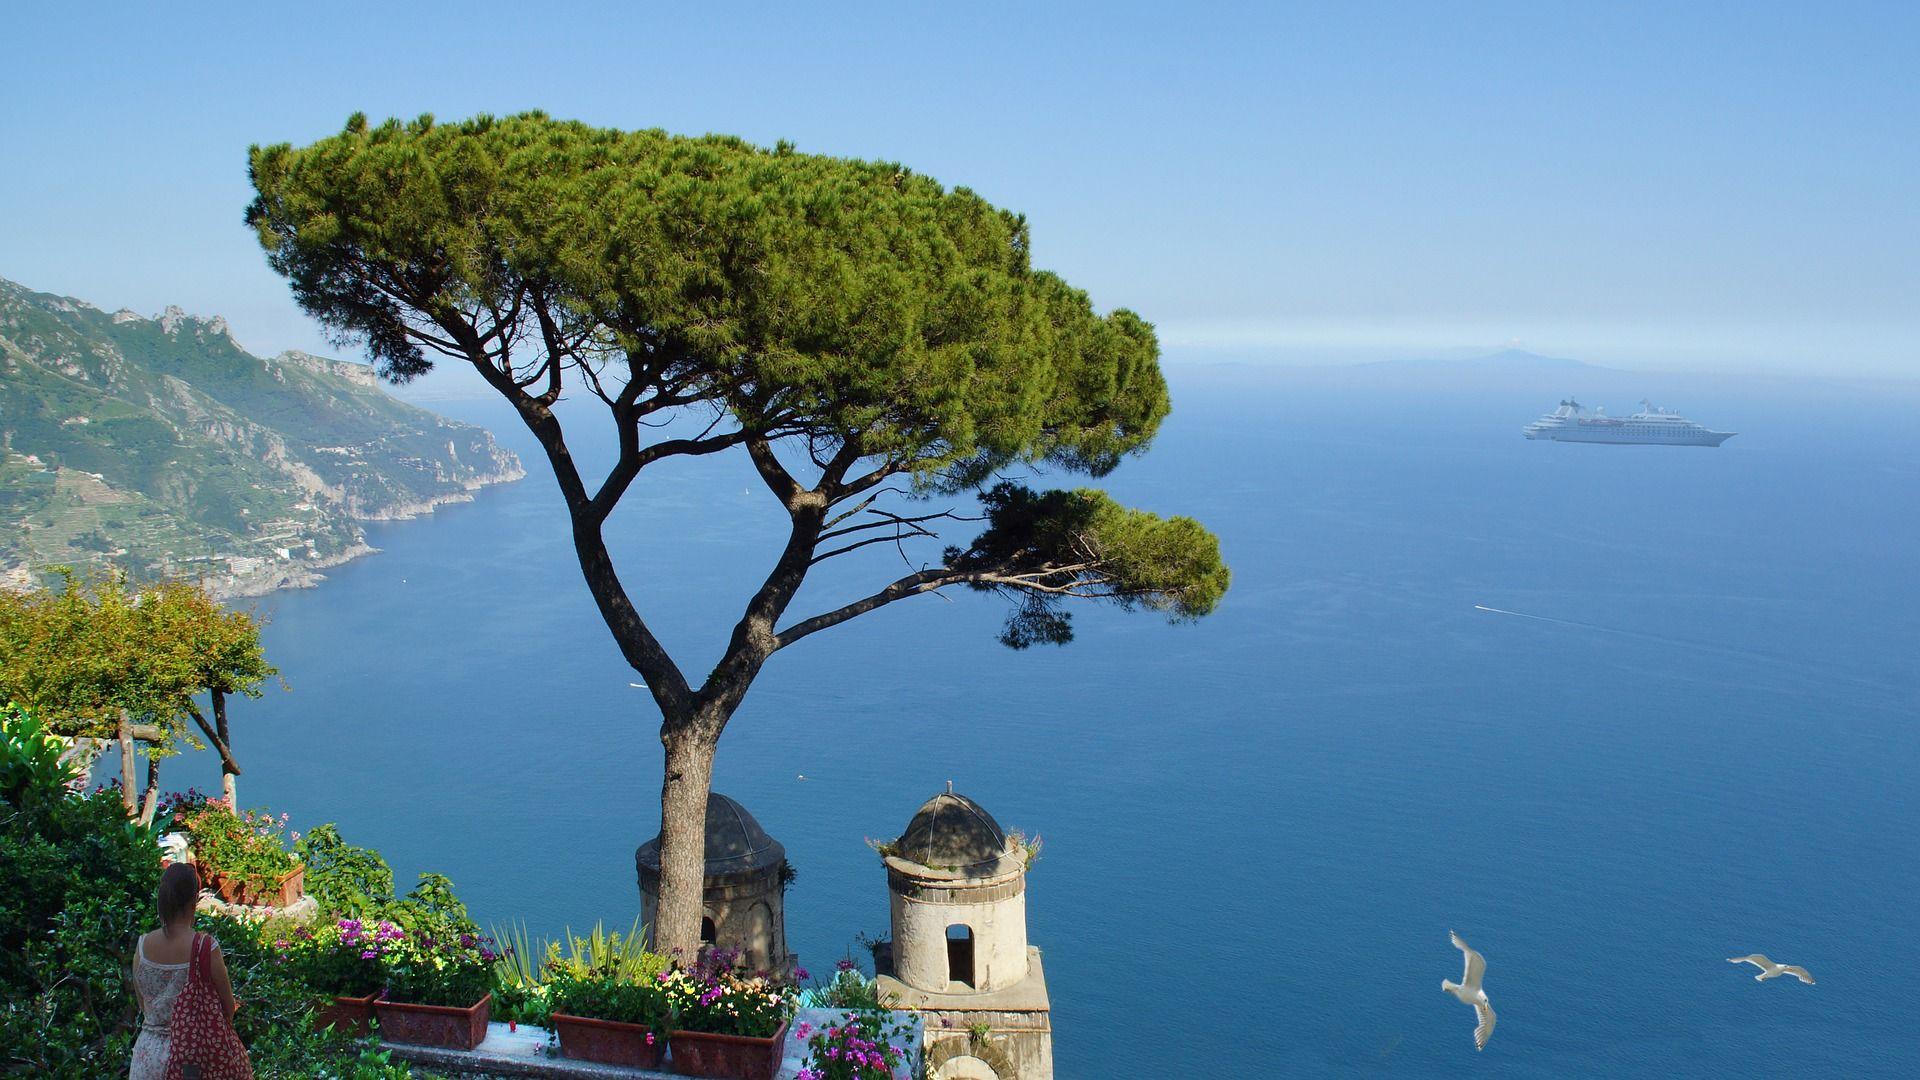 Vacante Coasta Amalfitana